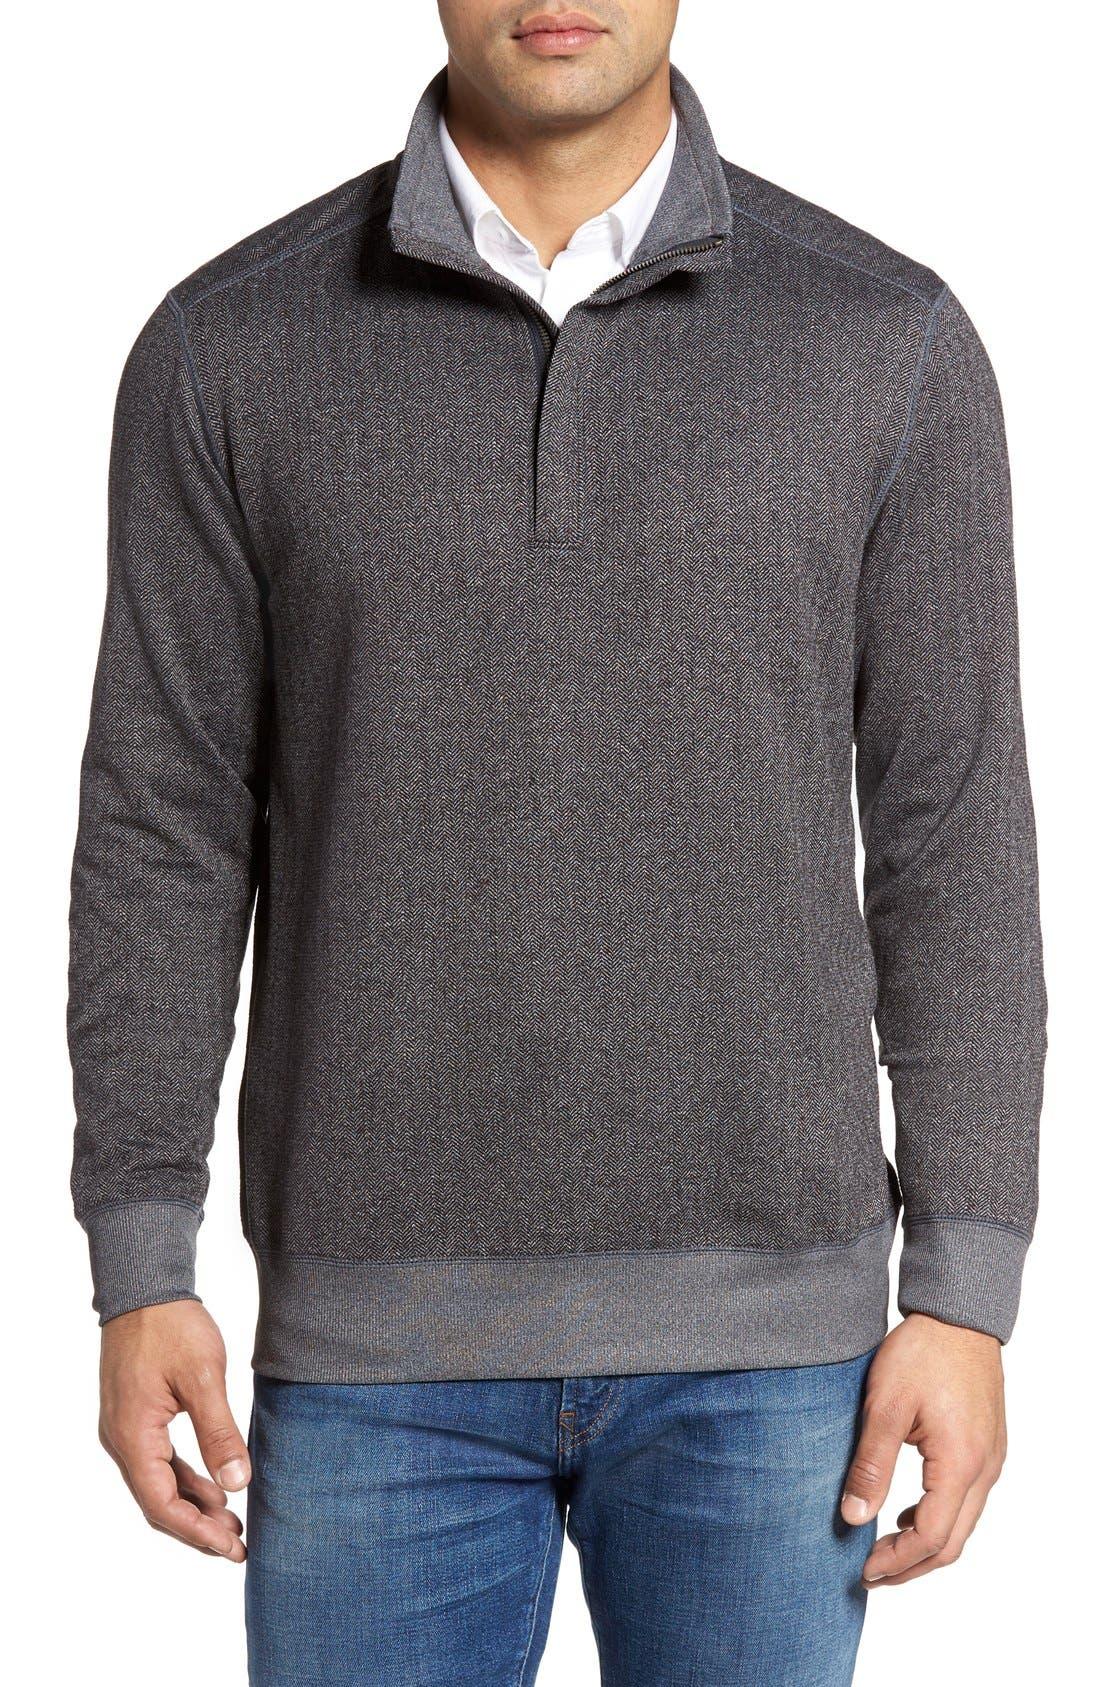 Main Image - Tommy Bahama Pro Formance Quarter Zip Sweater